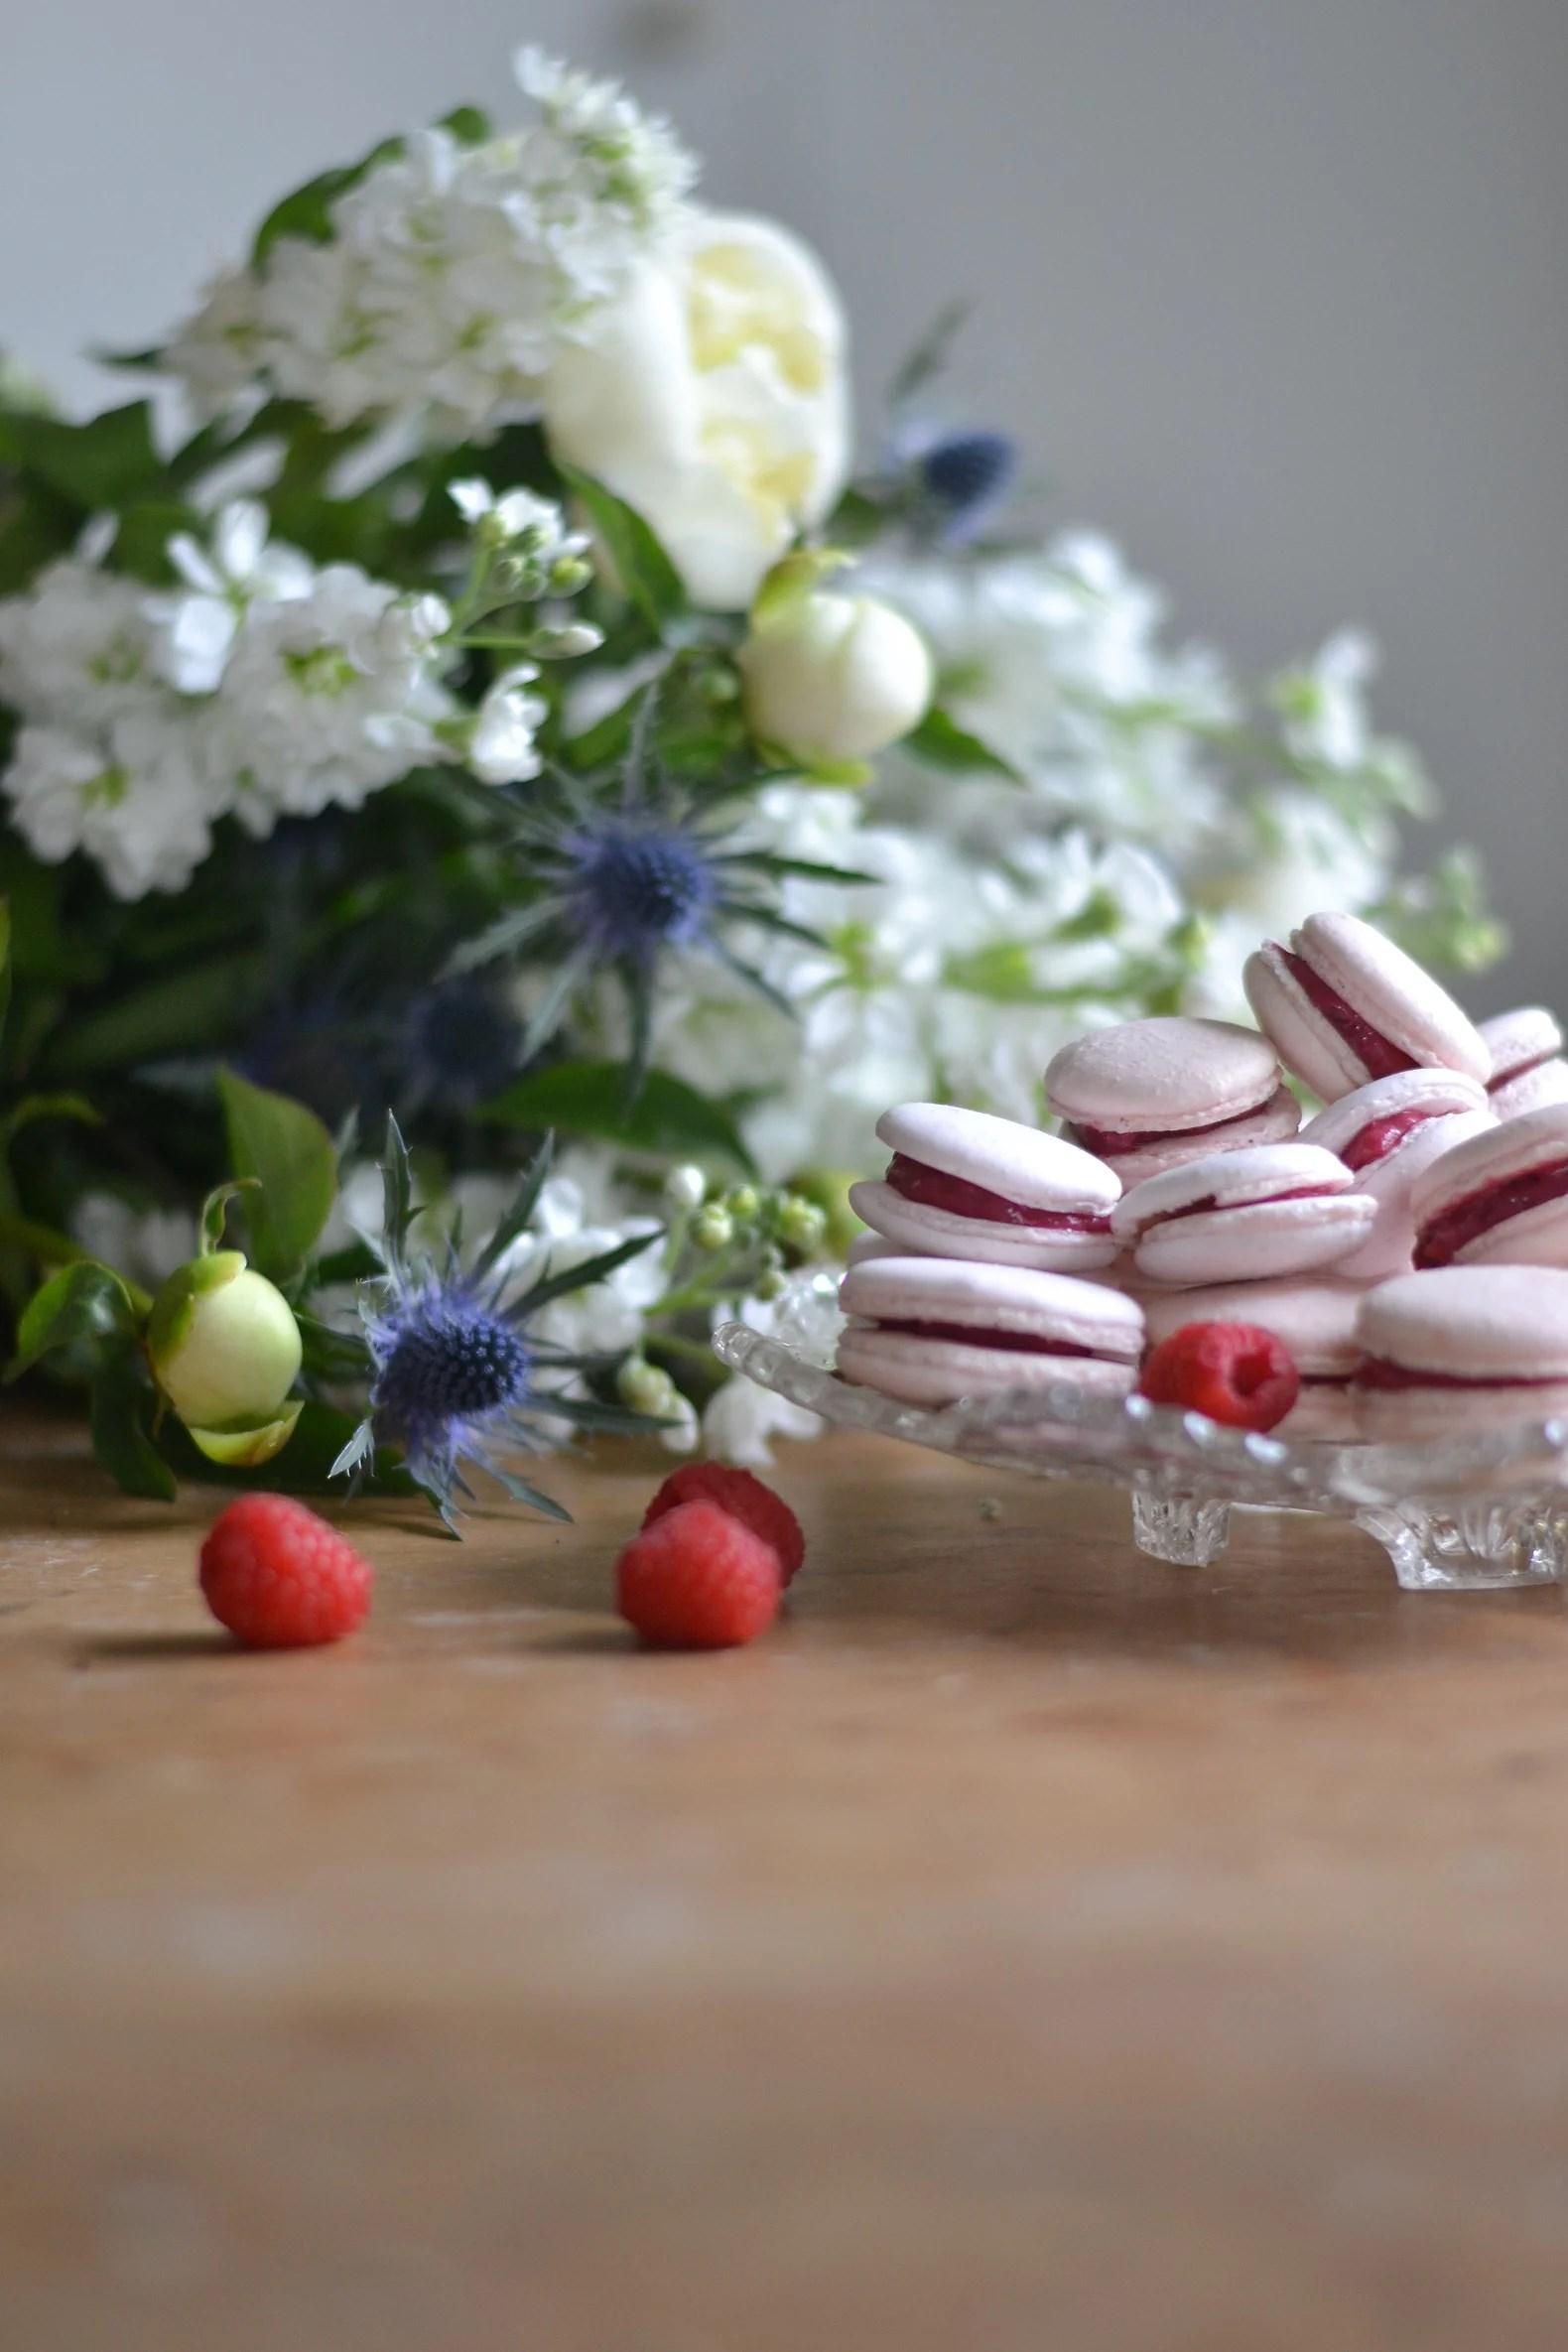 Macarons med hallon- & vitchokladkräm